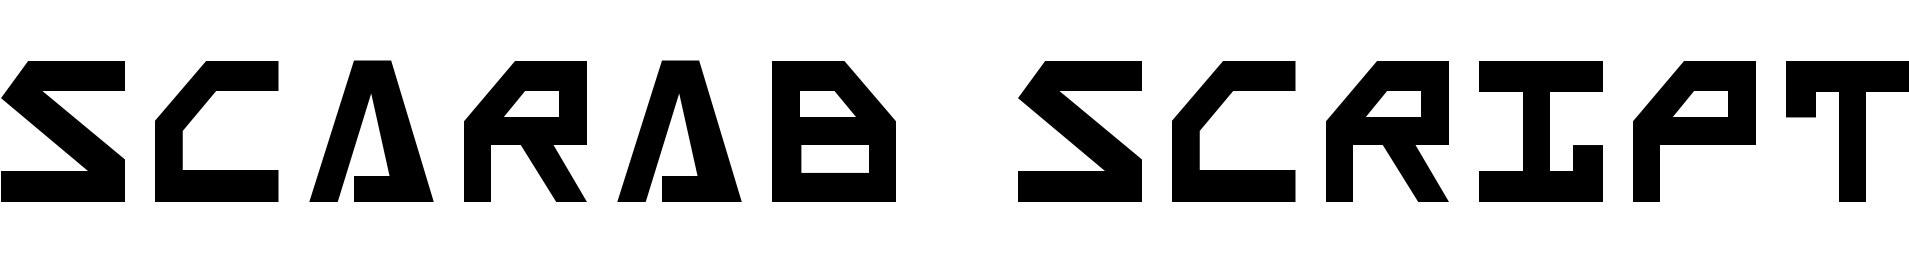 Scarab Script